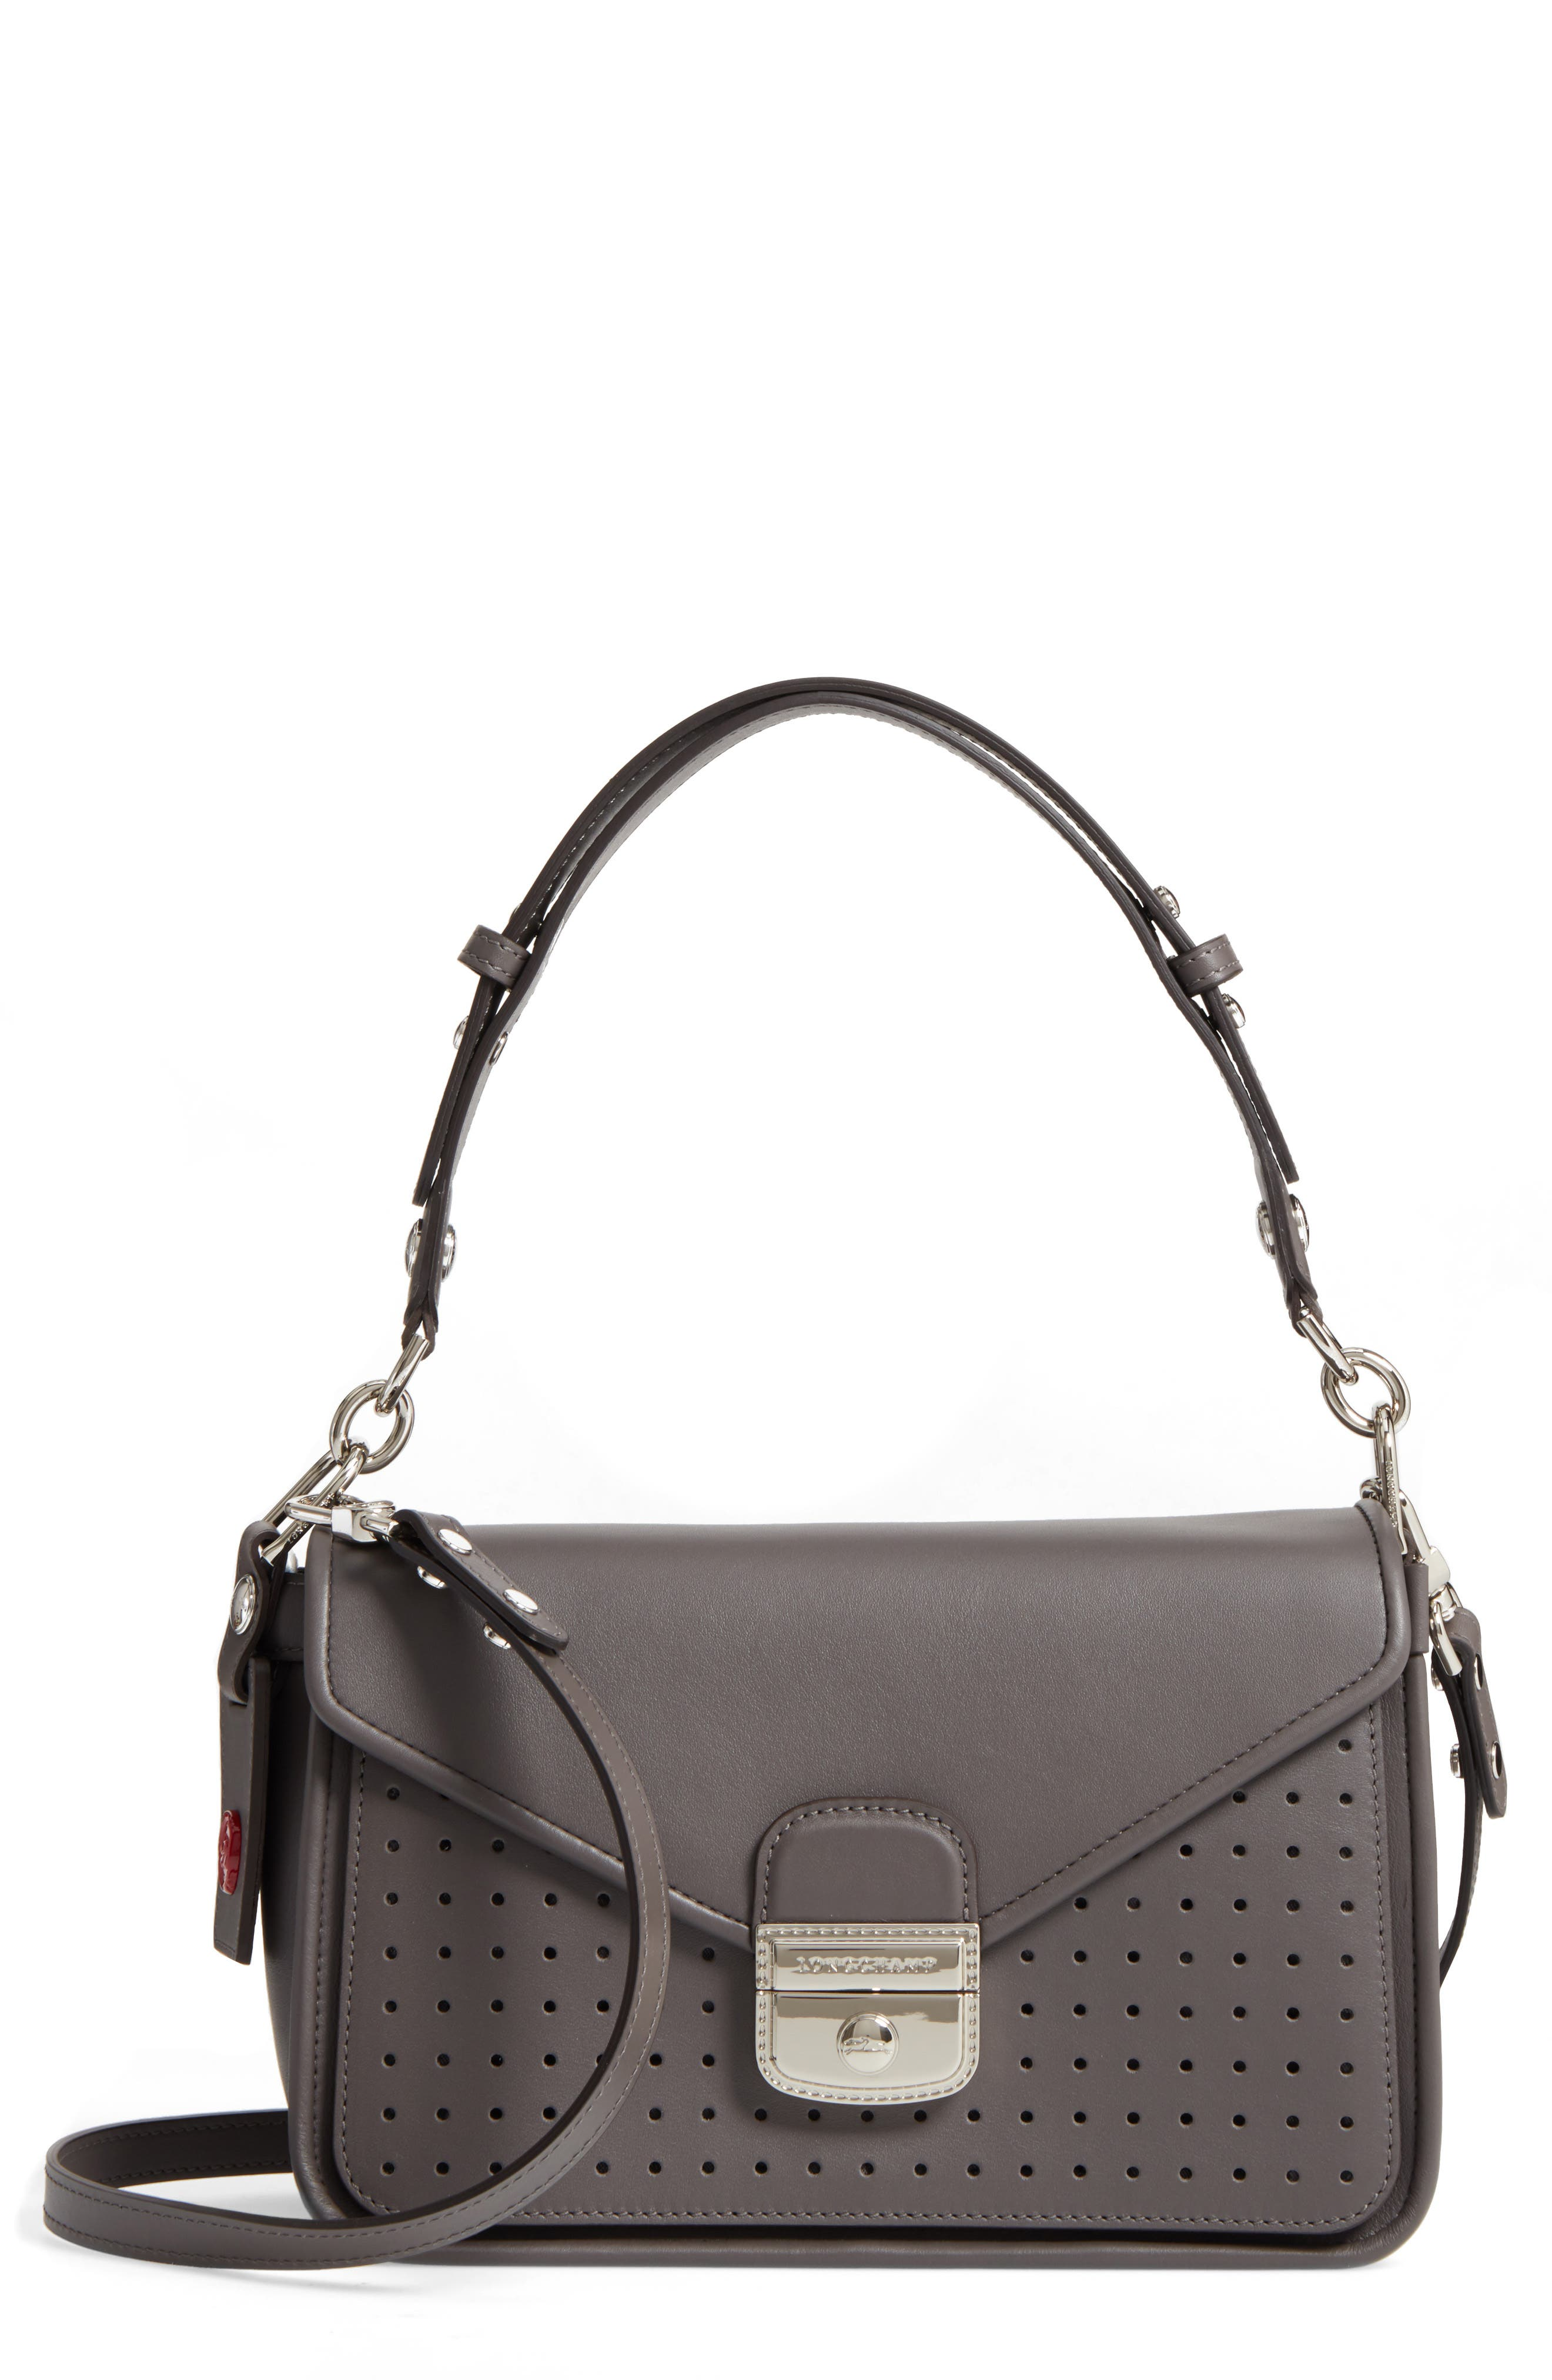 Alternate Image 1 Selected - Longchamp Mademoiselle Calfskin Leather Crossbody Bag